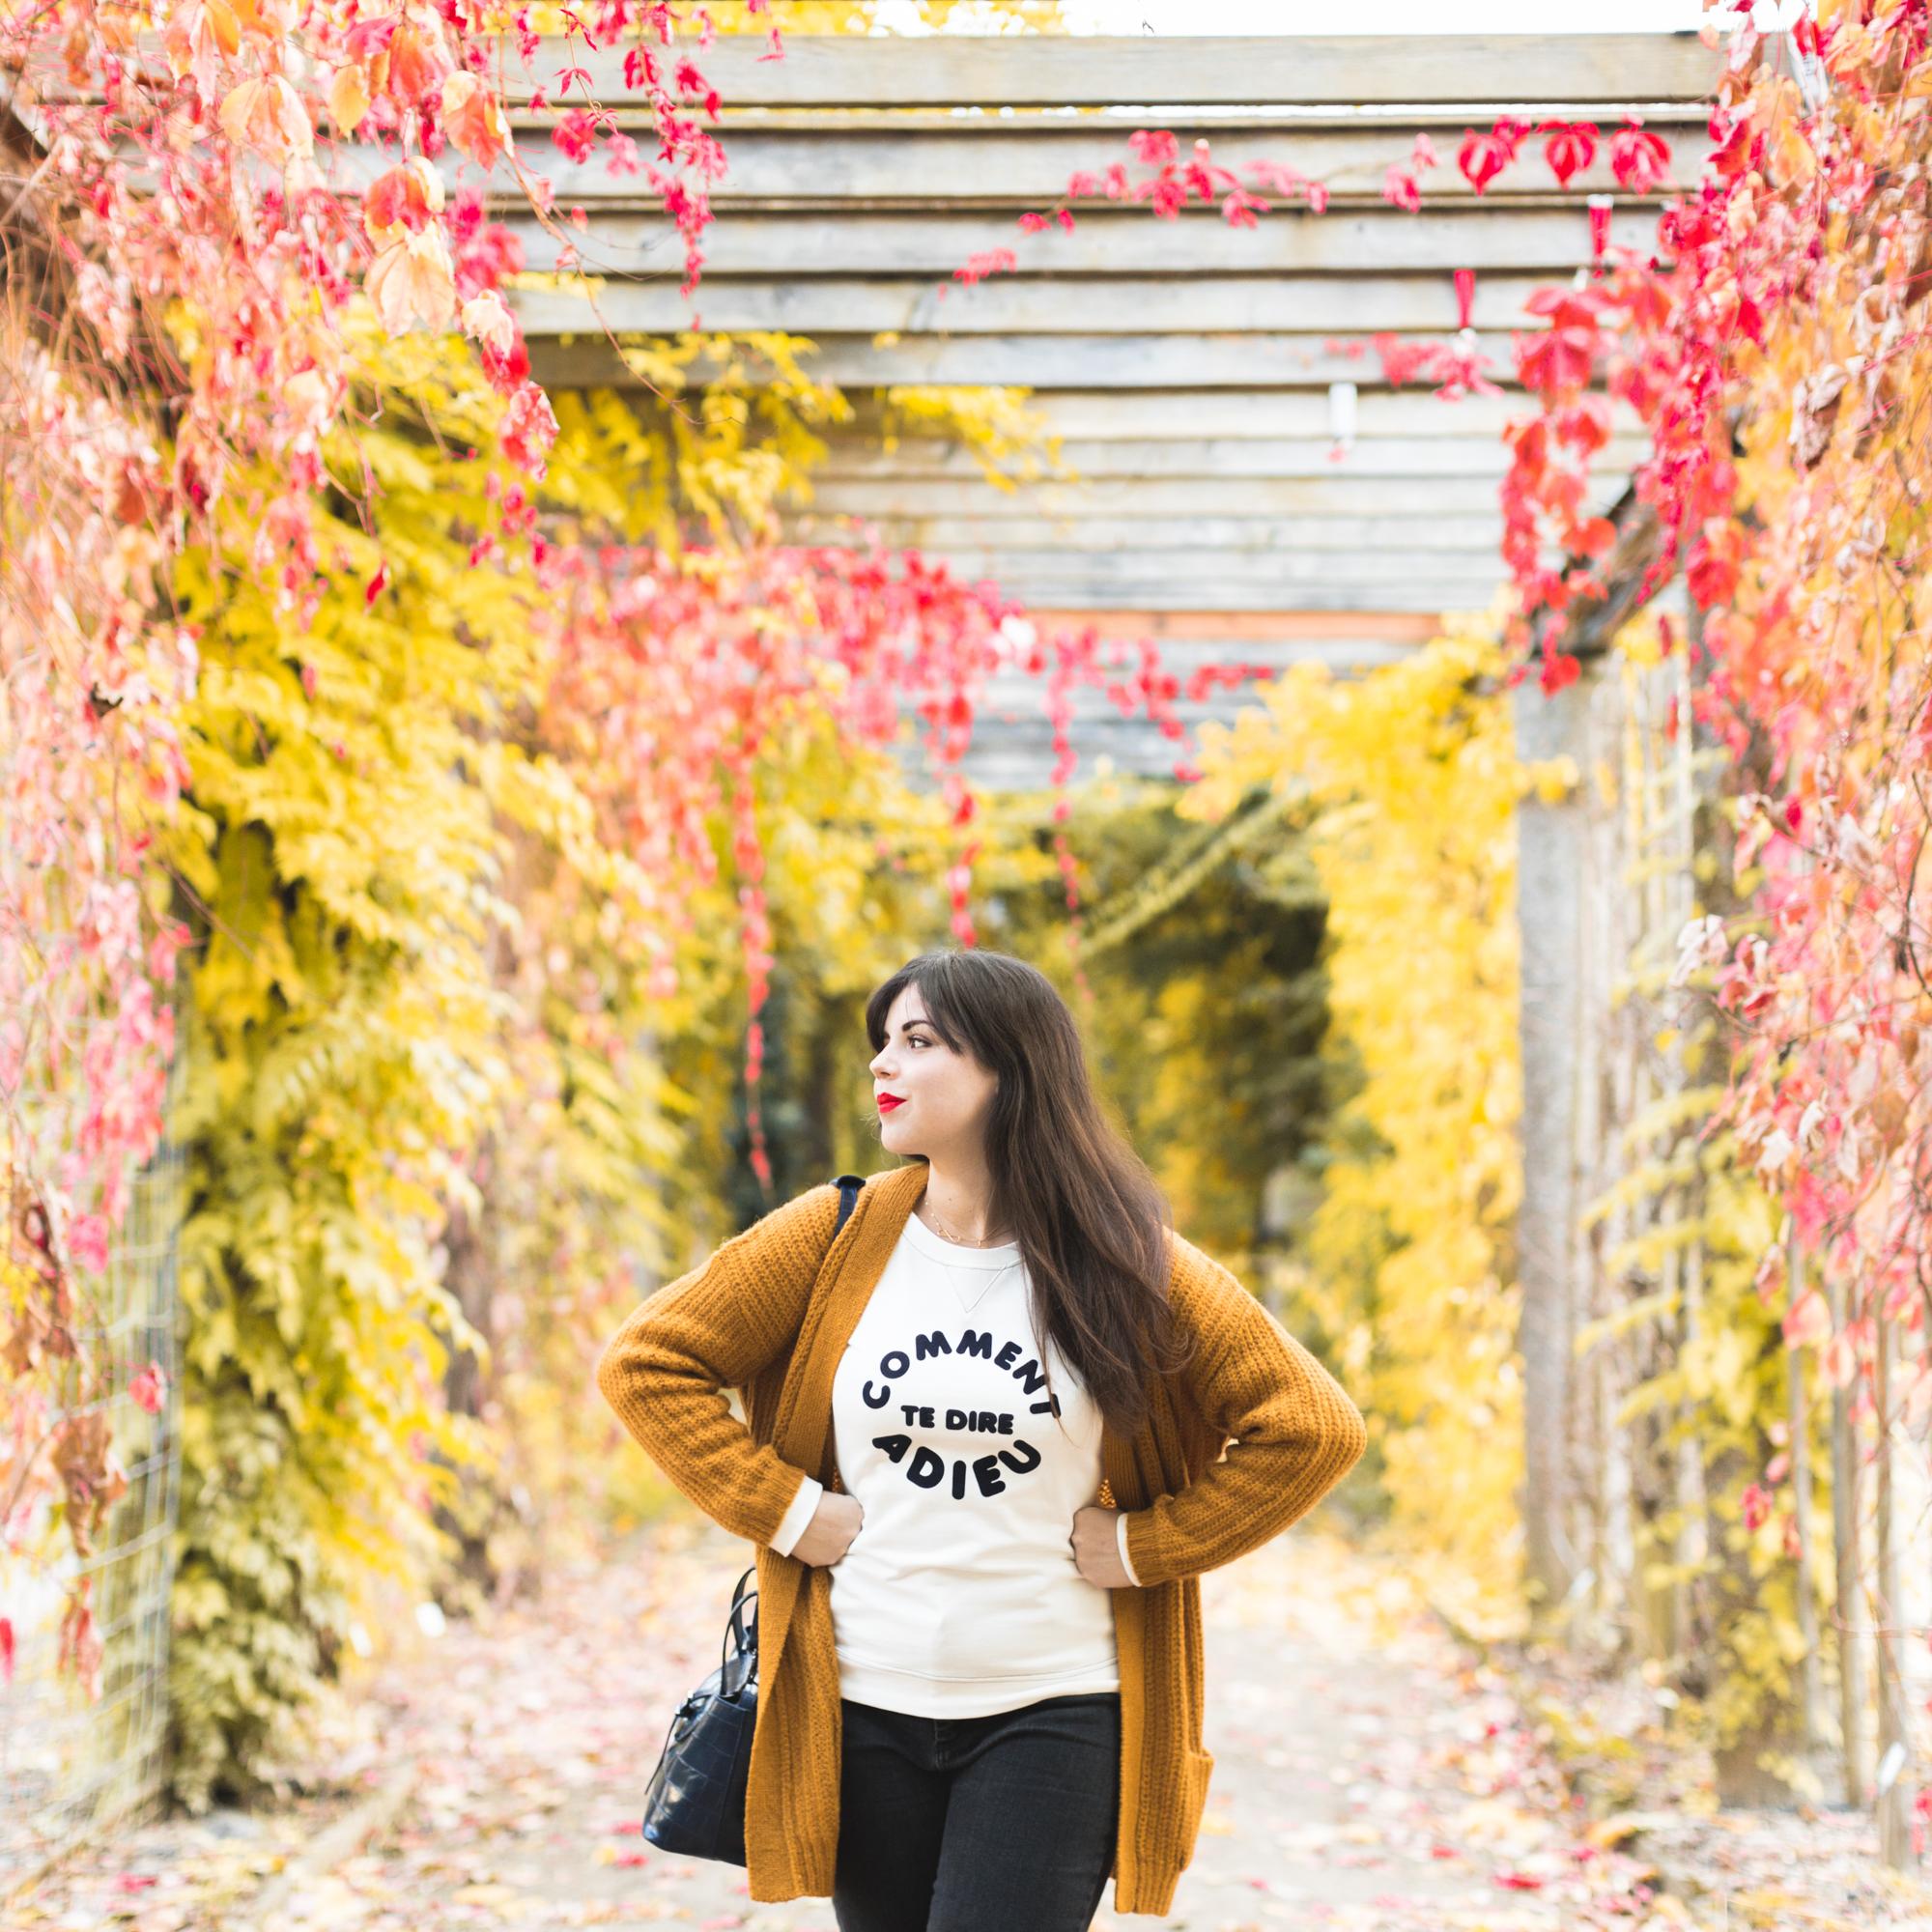 la_petite_francaise_ybd_meli_melo_ballerines_sezane_copyright_pauline_fashionblog_blog_mode-1-2